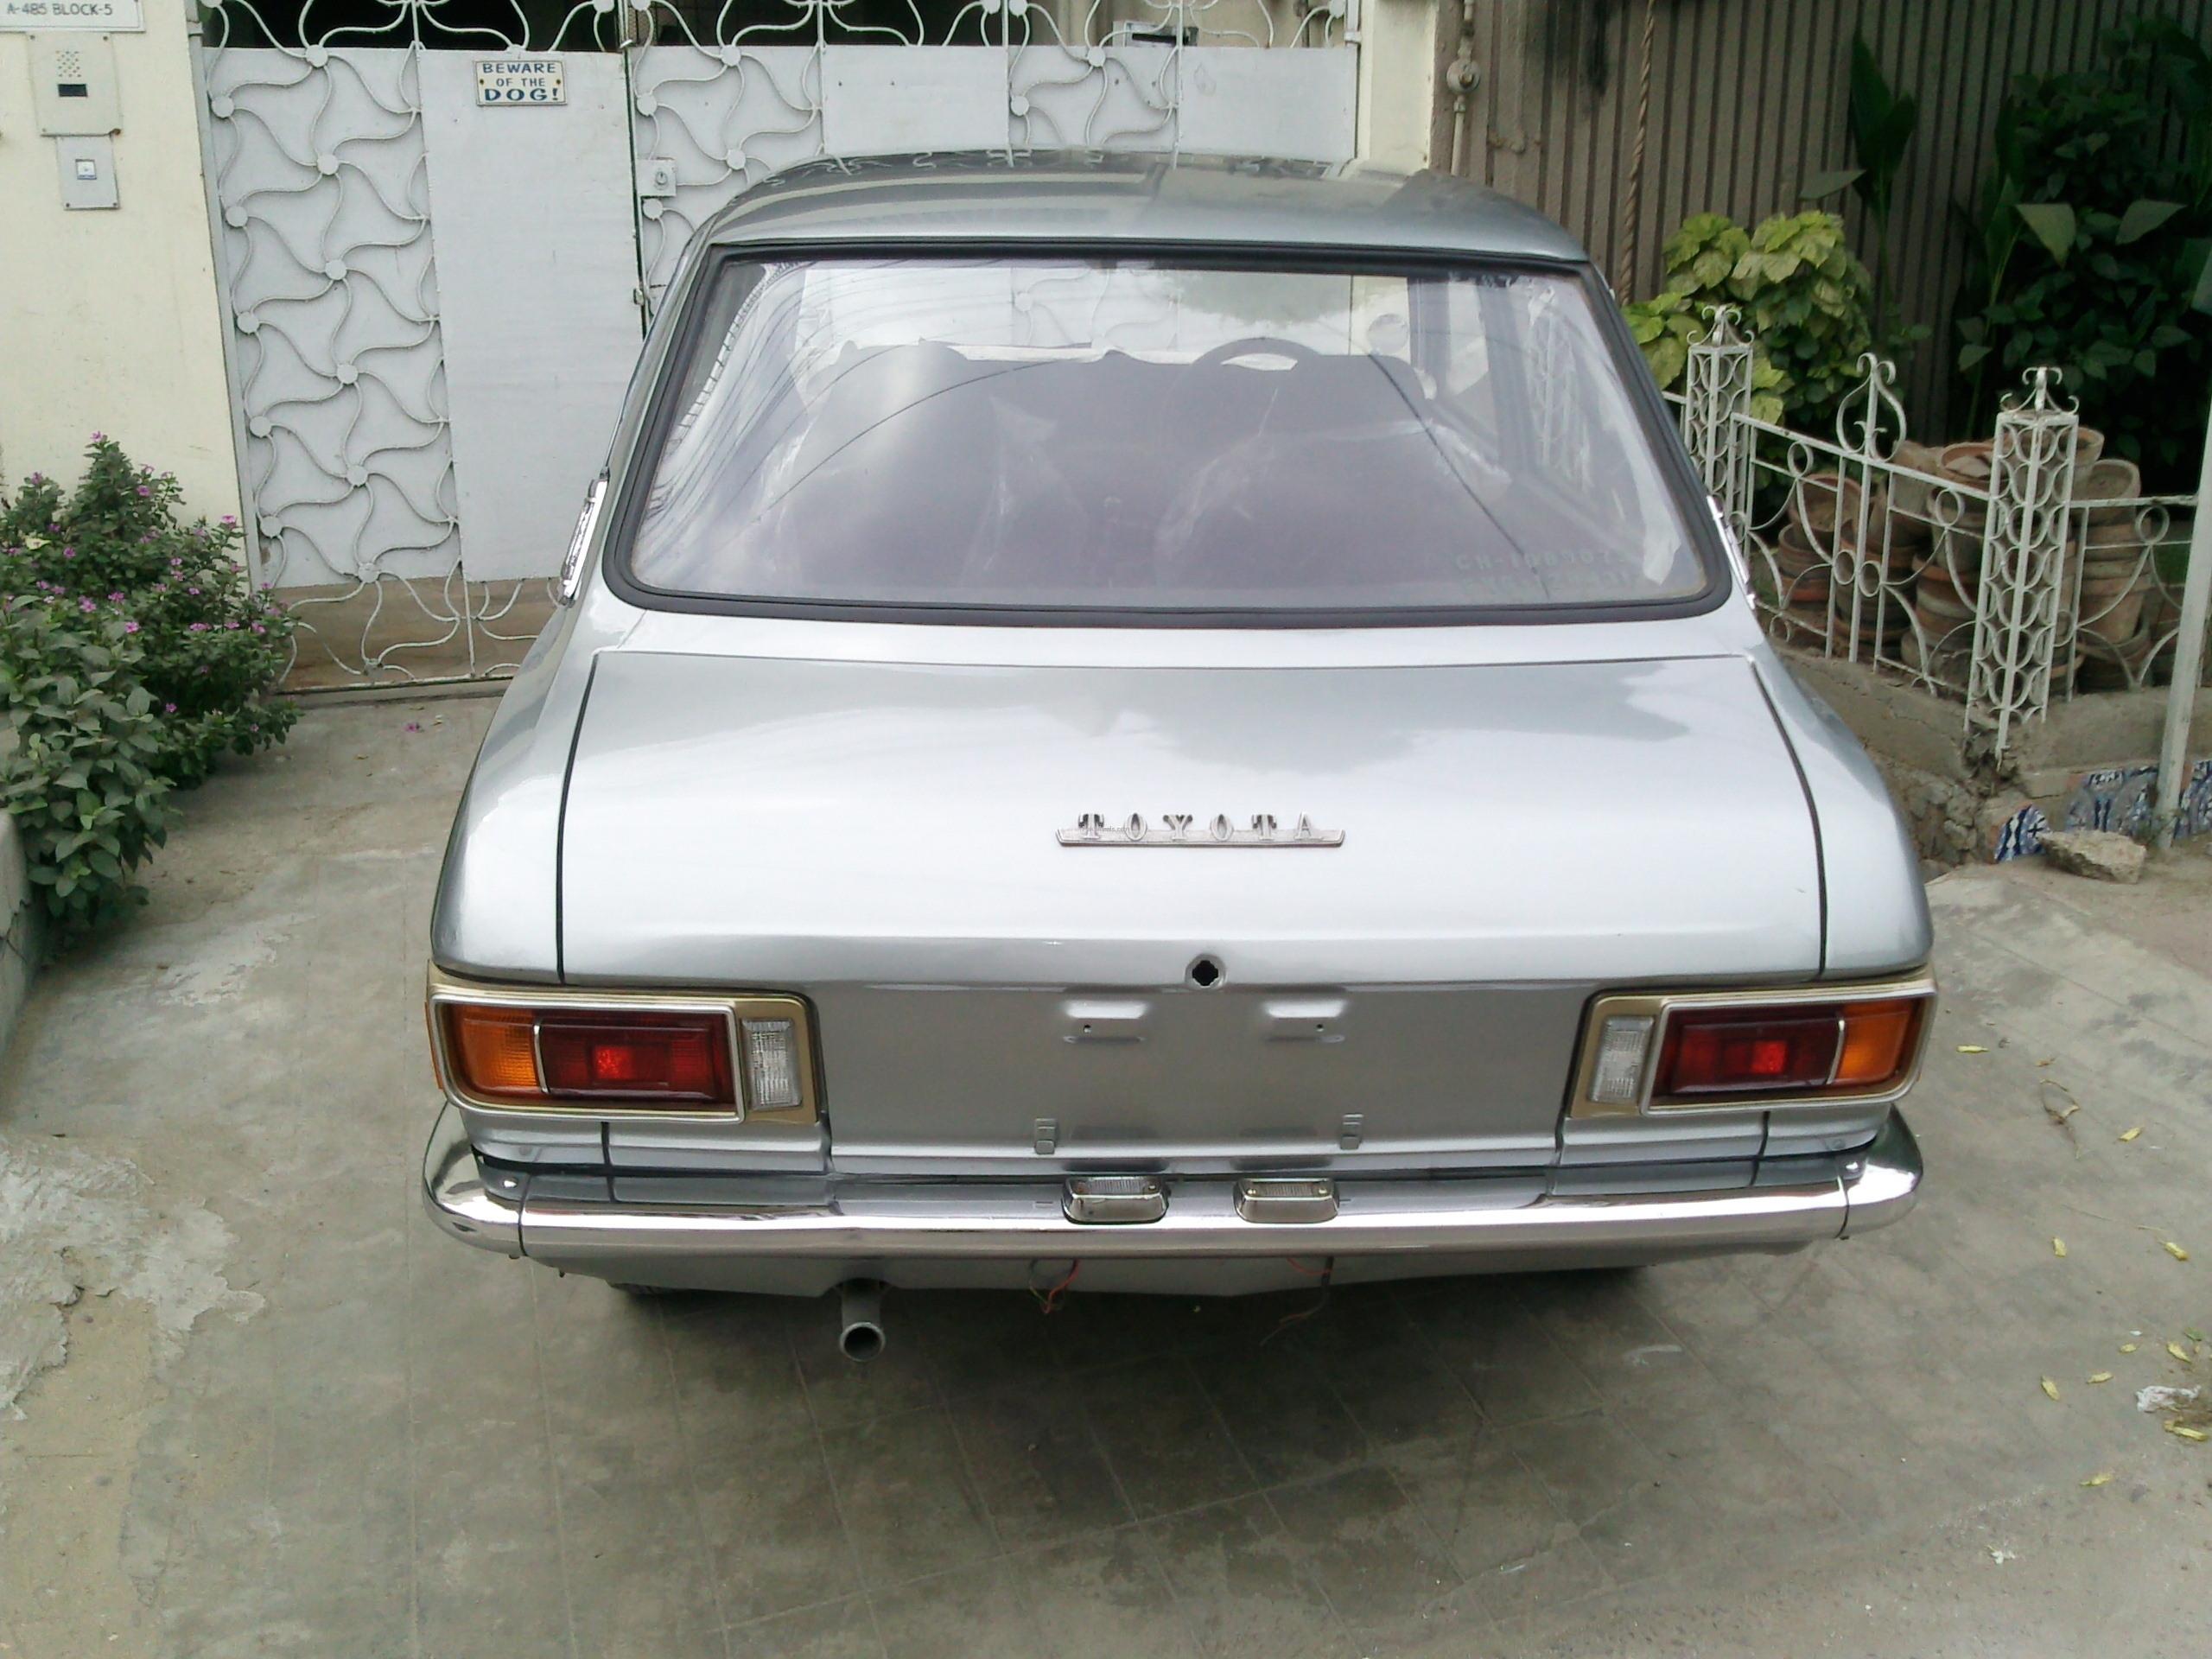 2012 Toyota Corolla For Sale >> Toyota Corolla 1974 of Corolla74 - Member Ride 17464 | PakWheels